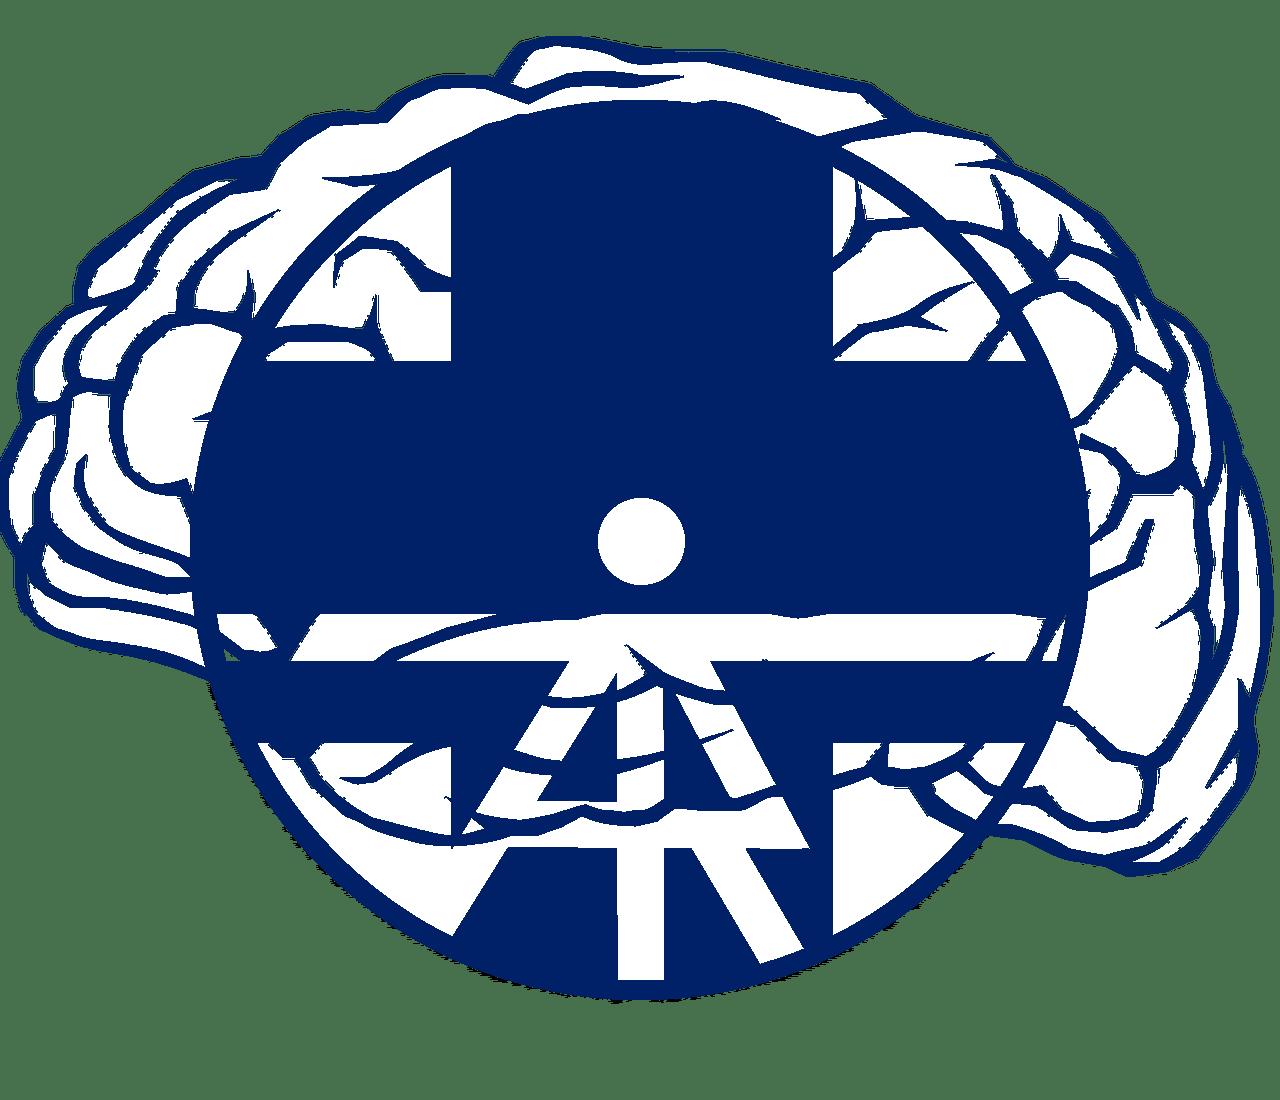 logo A.I.FI. modificato